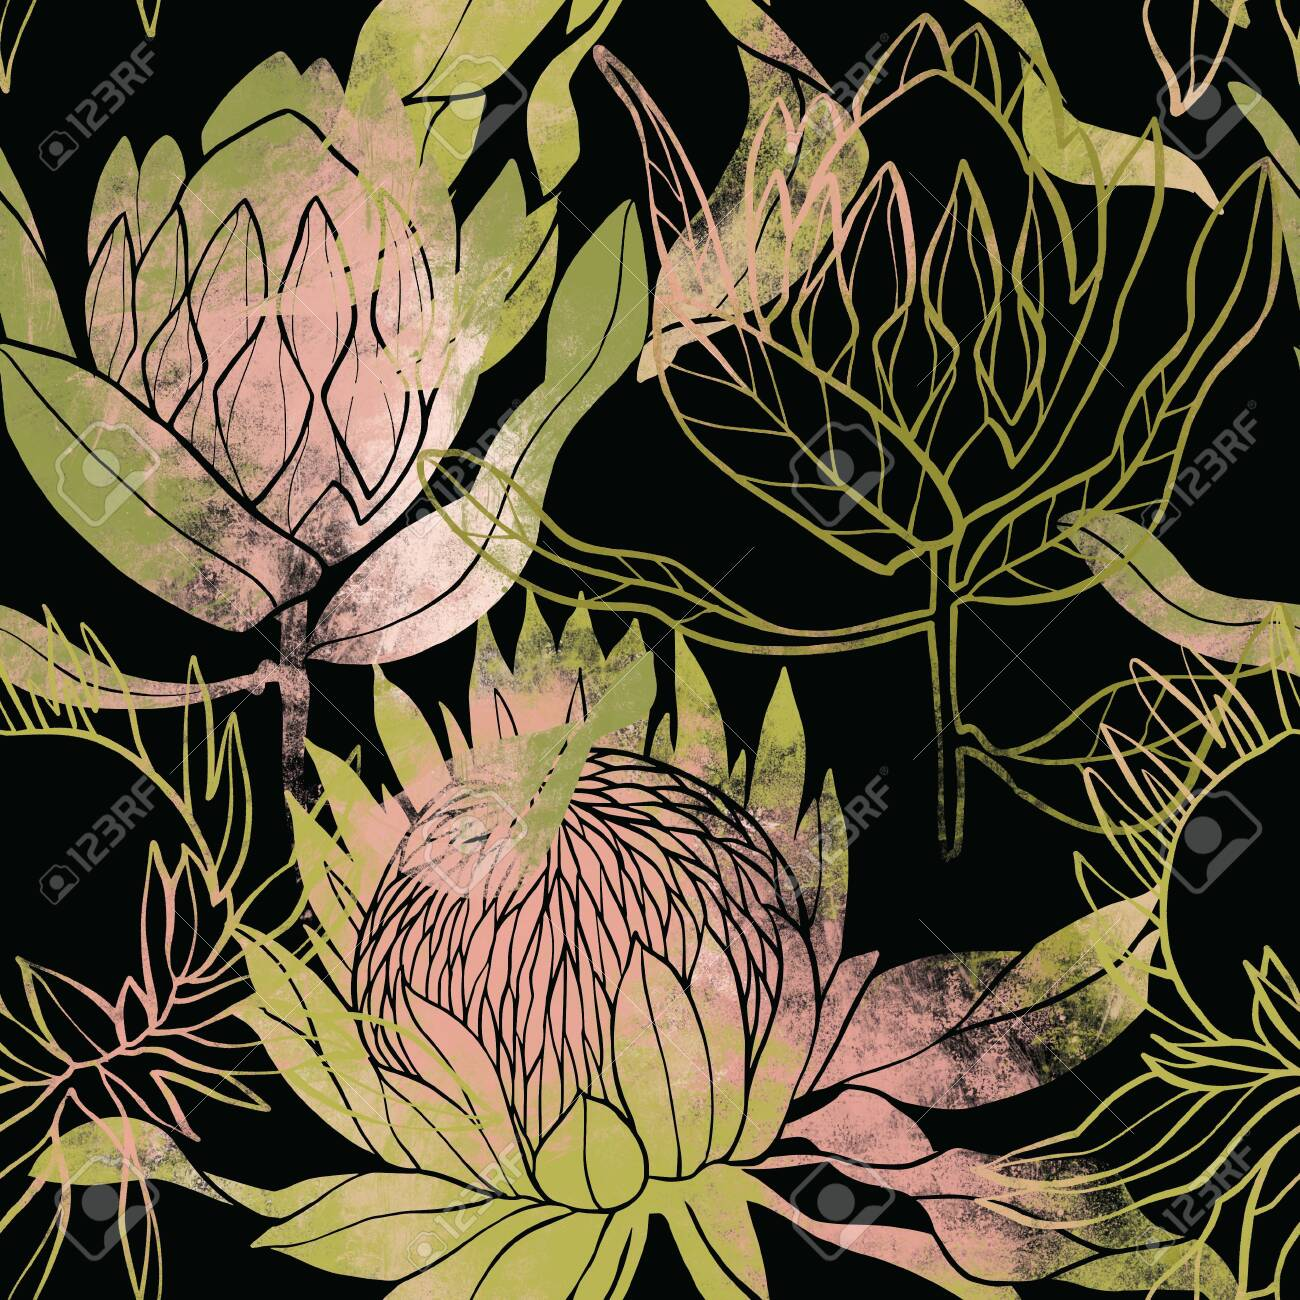 Pink and green flower pattern. Protea flower. Hand drawn illustration. Fullsize raster artwork. - 132391940